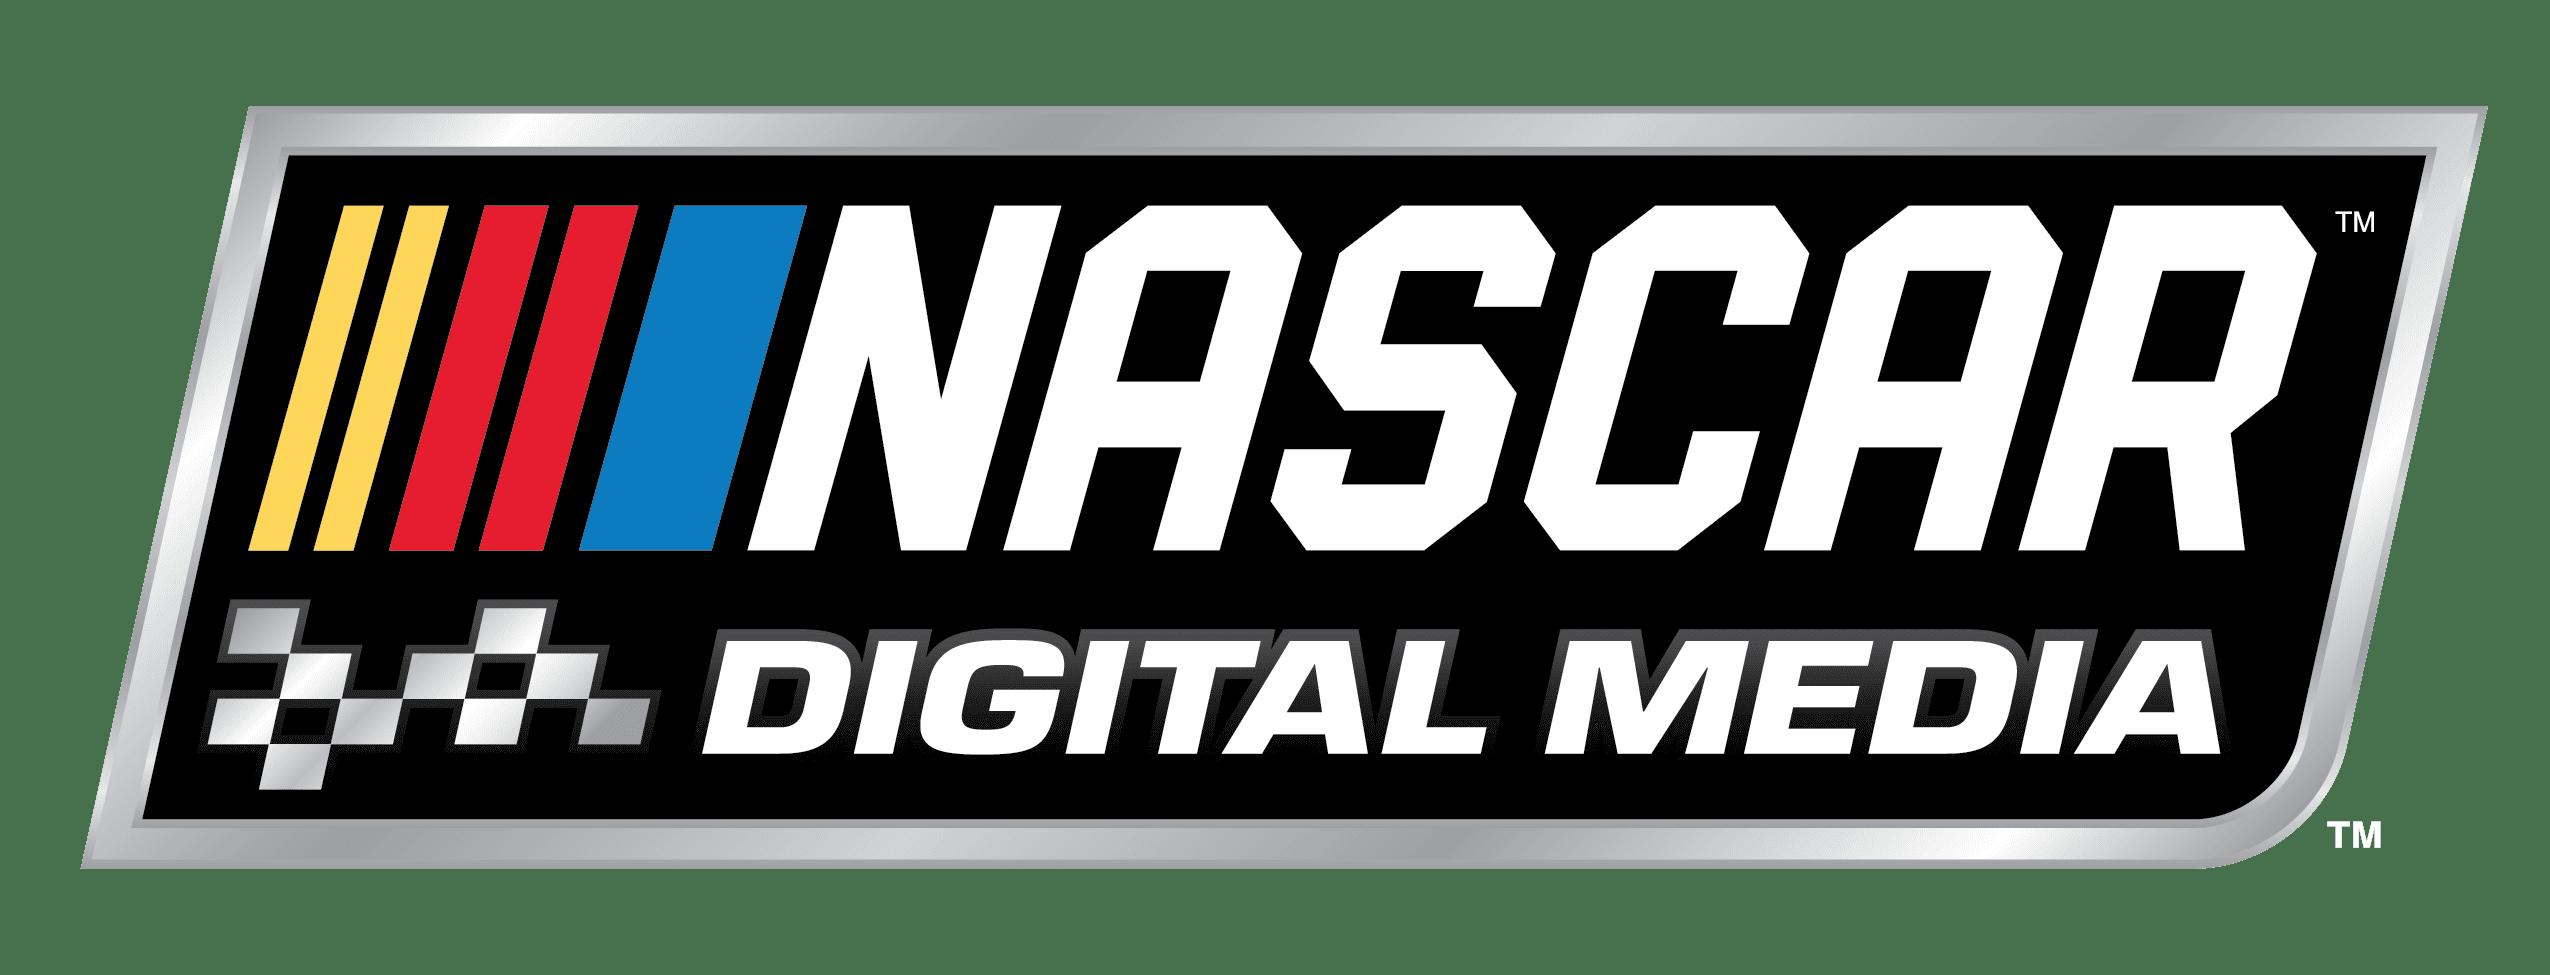 NASCAR Digital Media